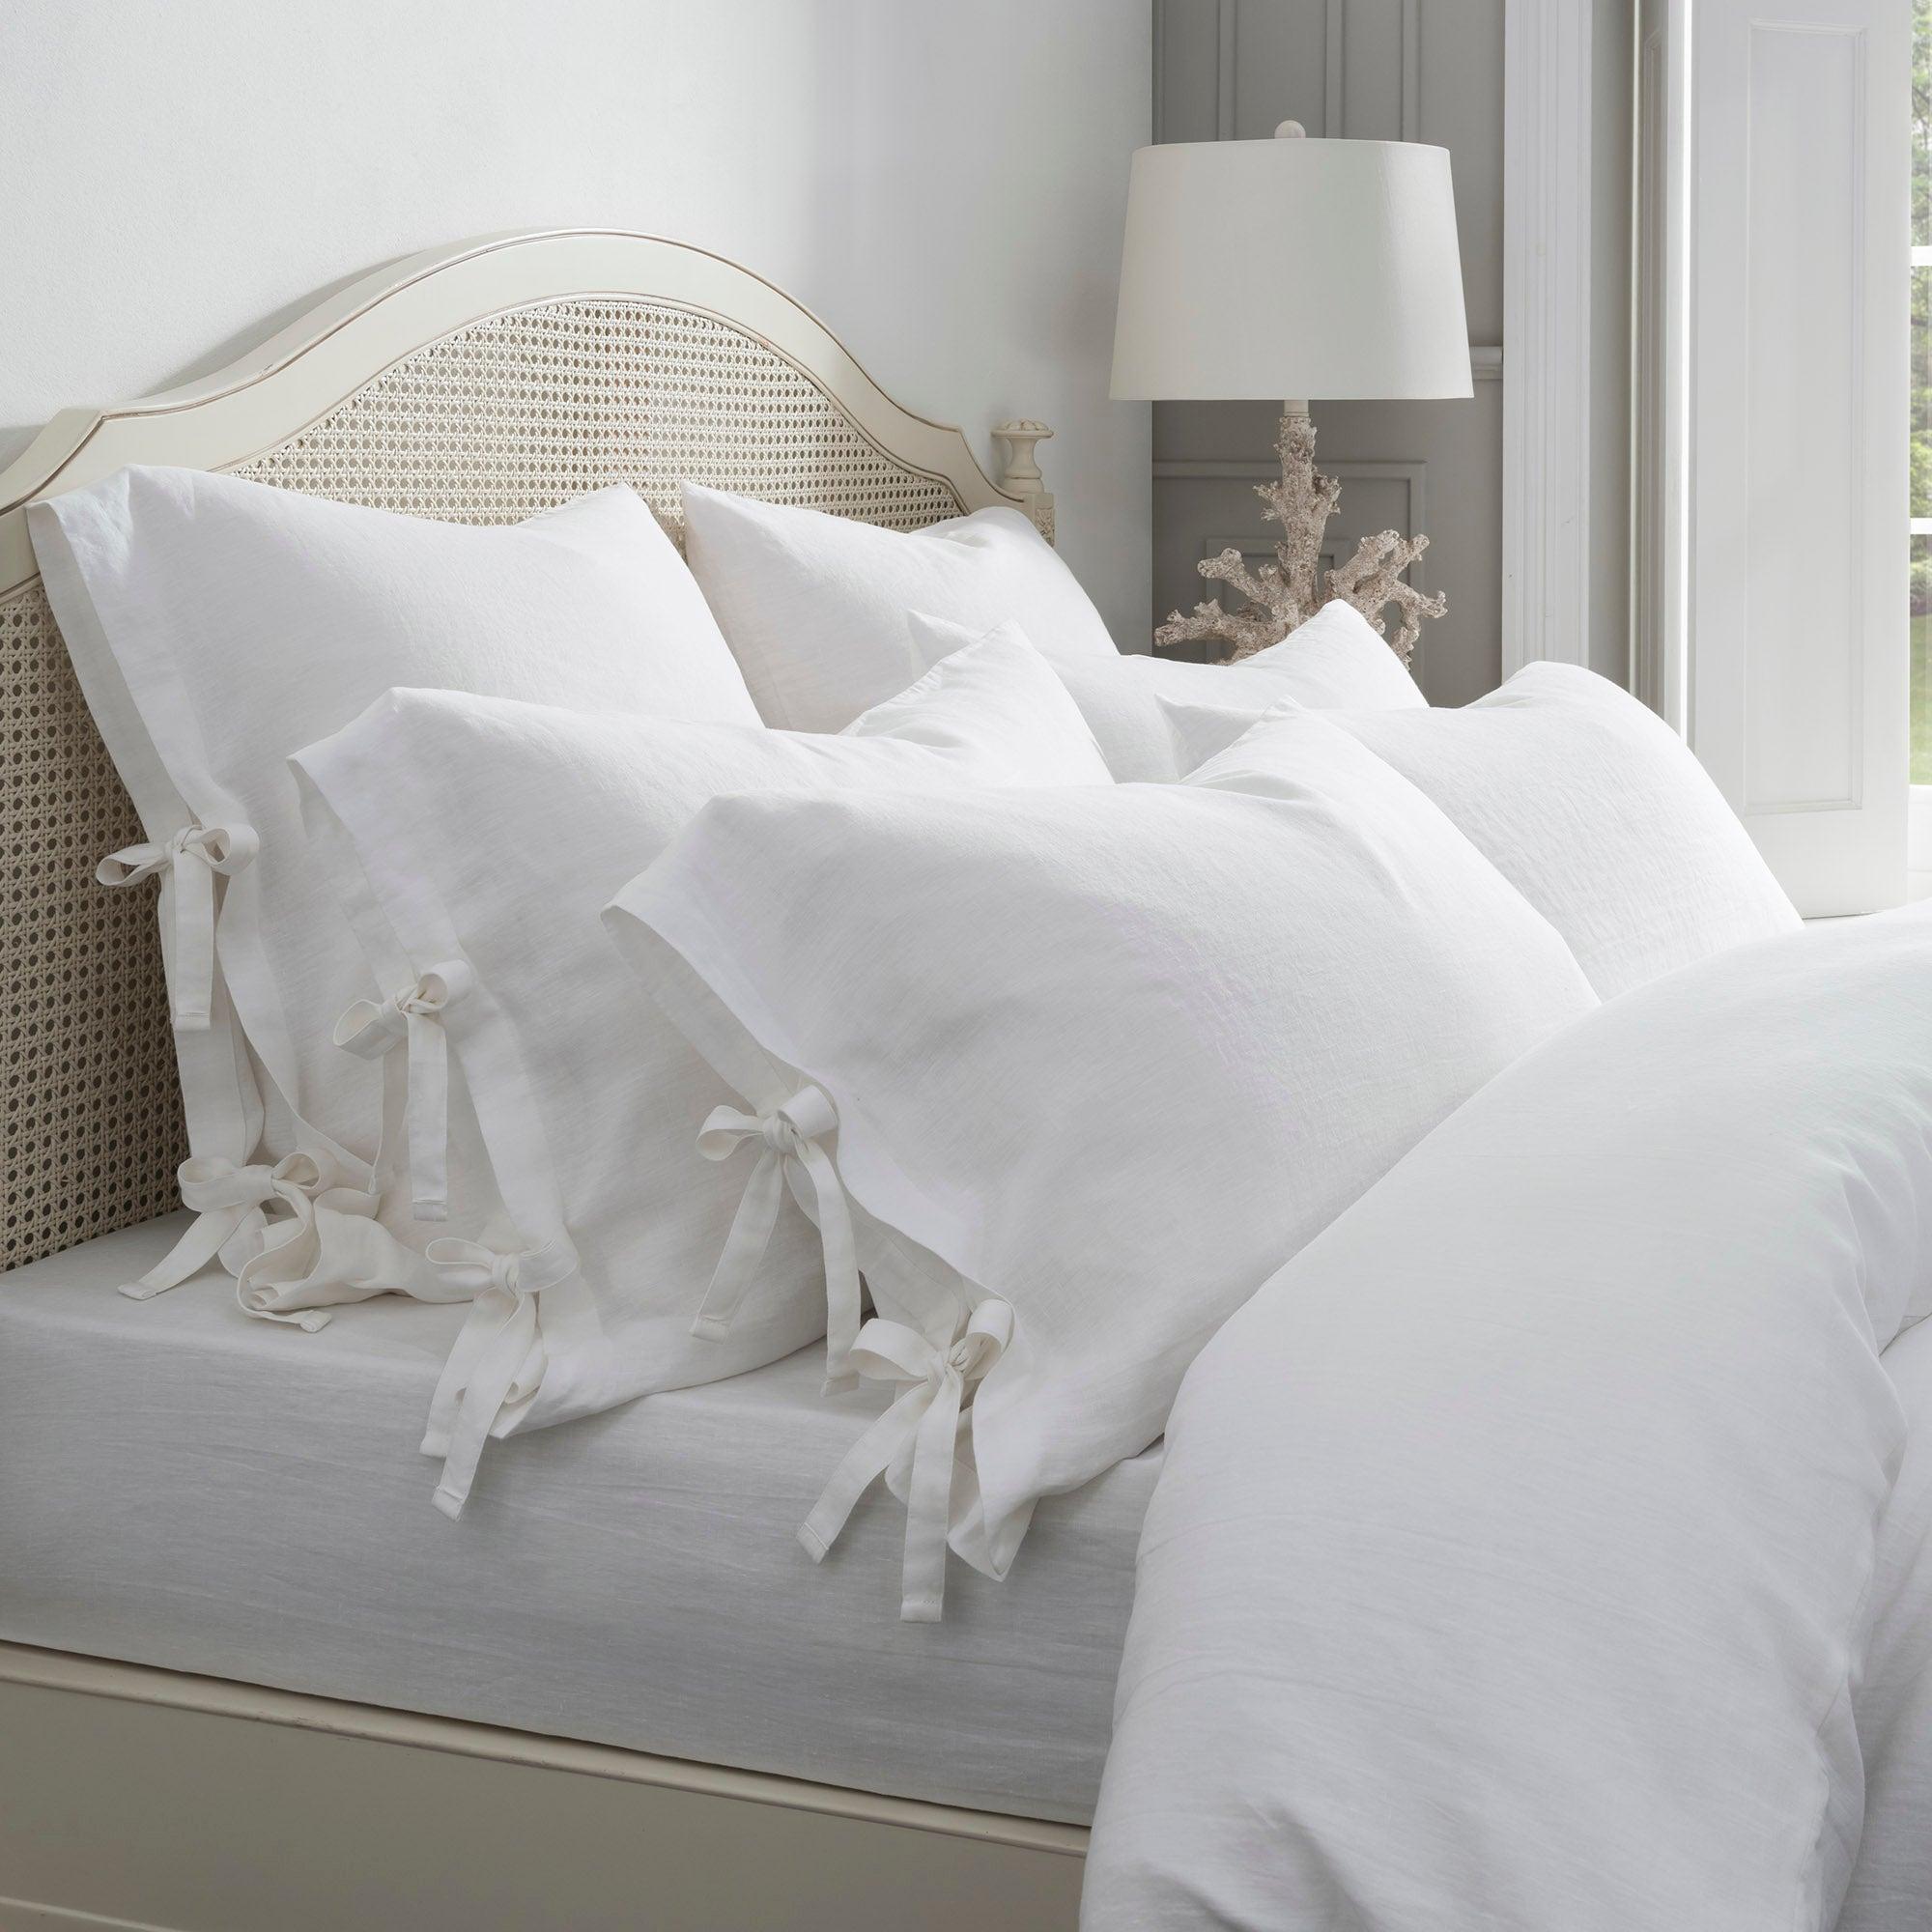 Image of Dorma 100% Linen White Continental Pillowcase White